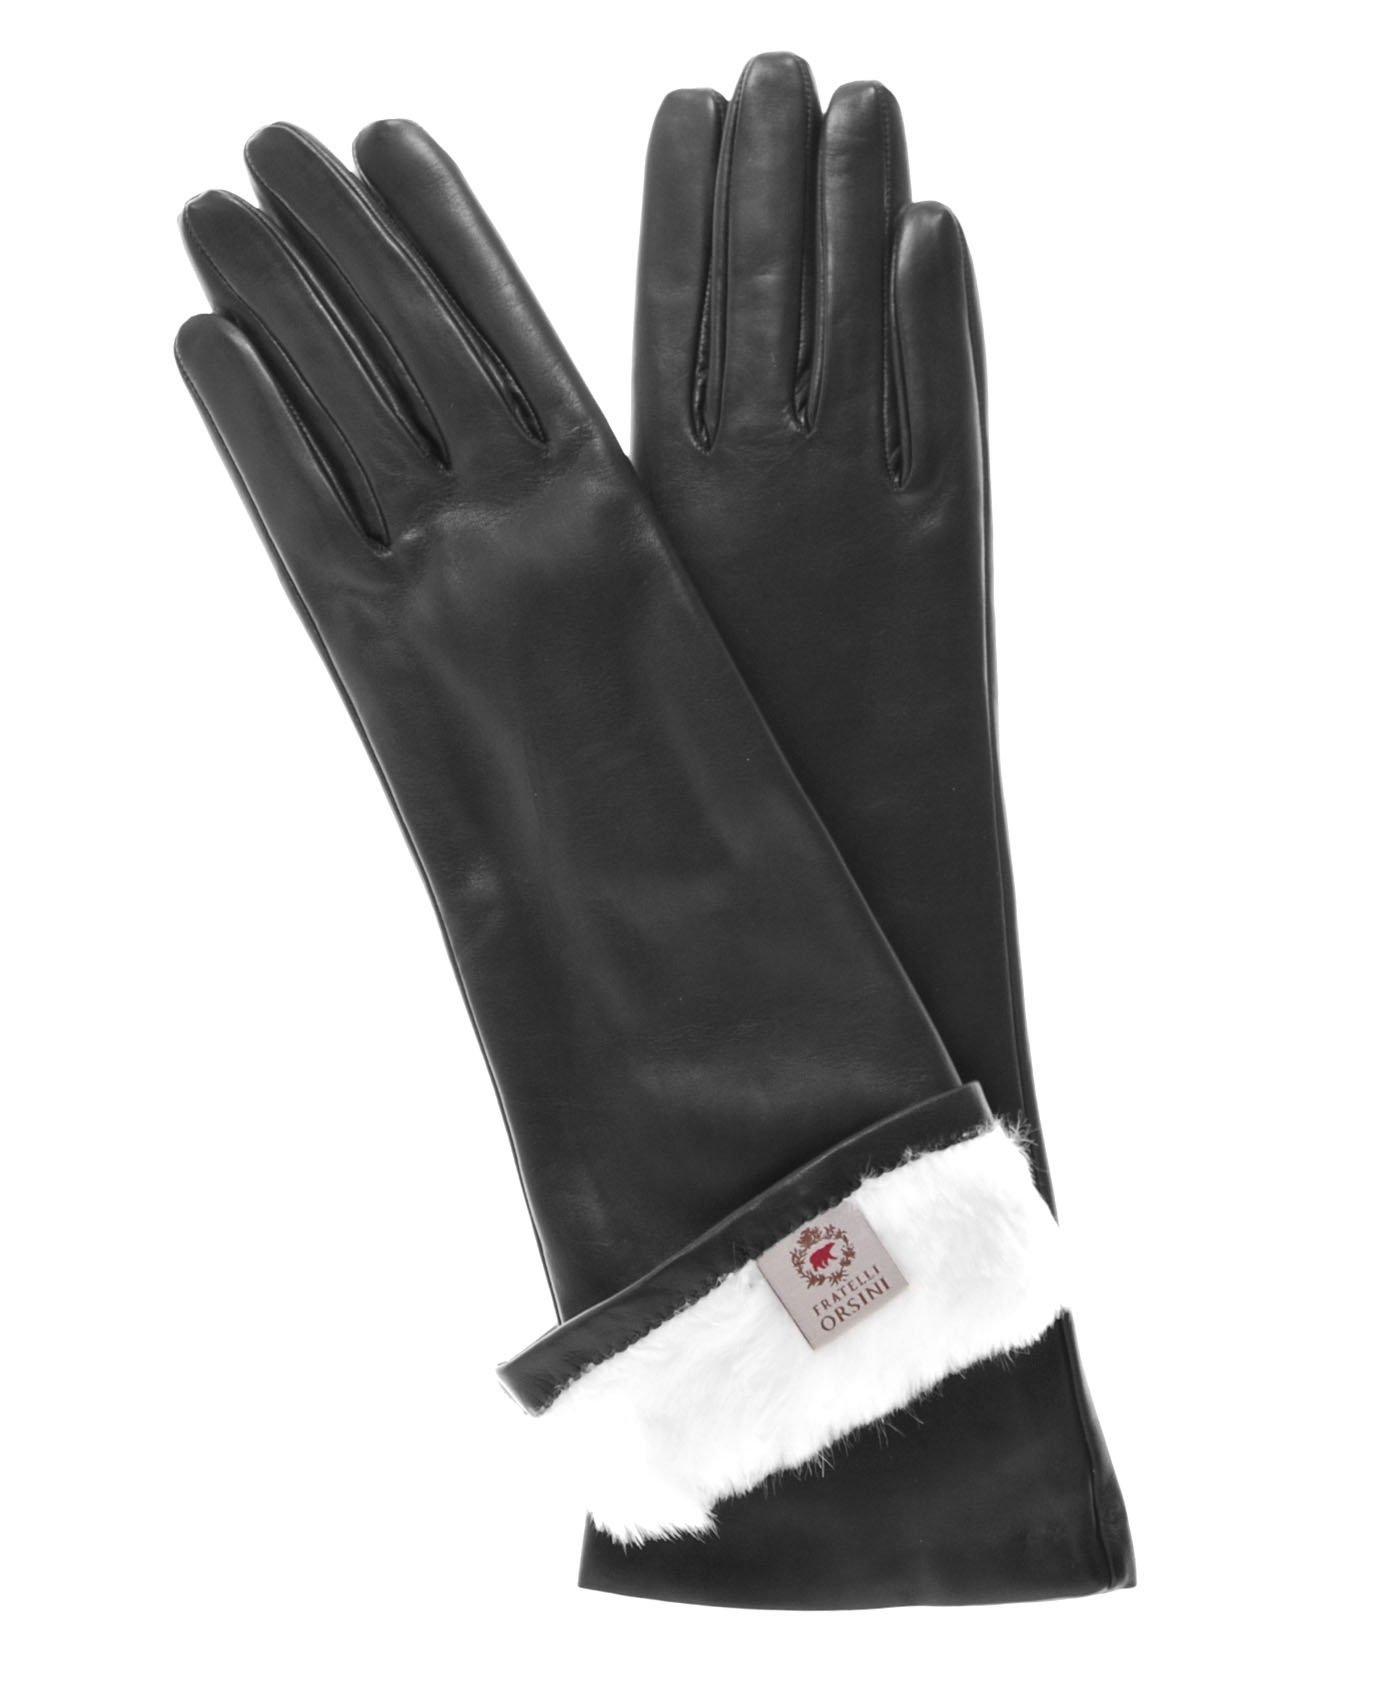 Fratelli Orsini Women's Italian Rabbit Fur Lined 6-Button Length Gloves Size 7 1/2 Color Black